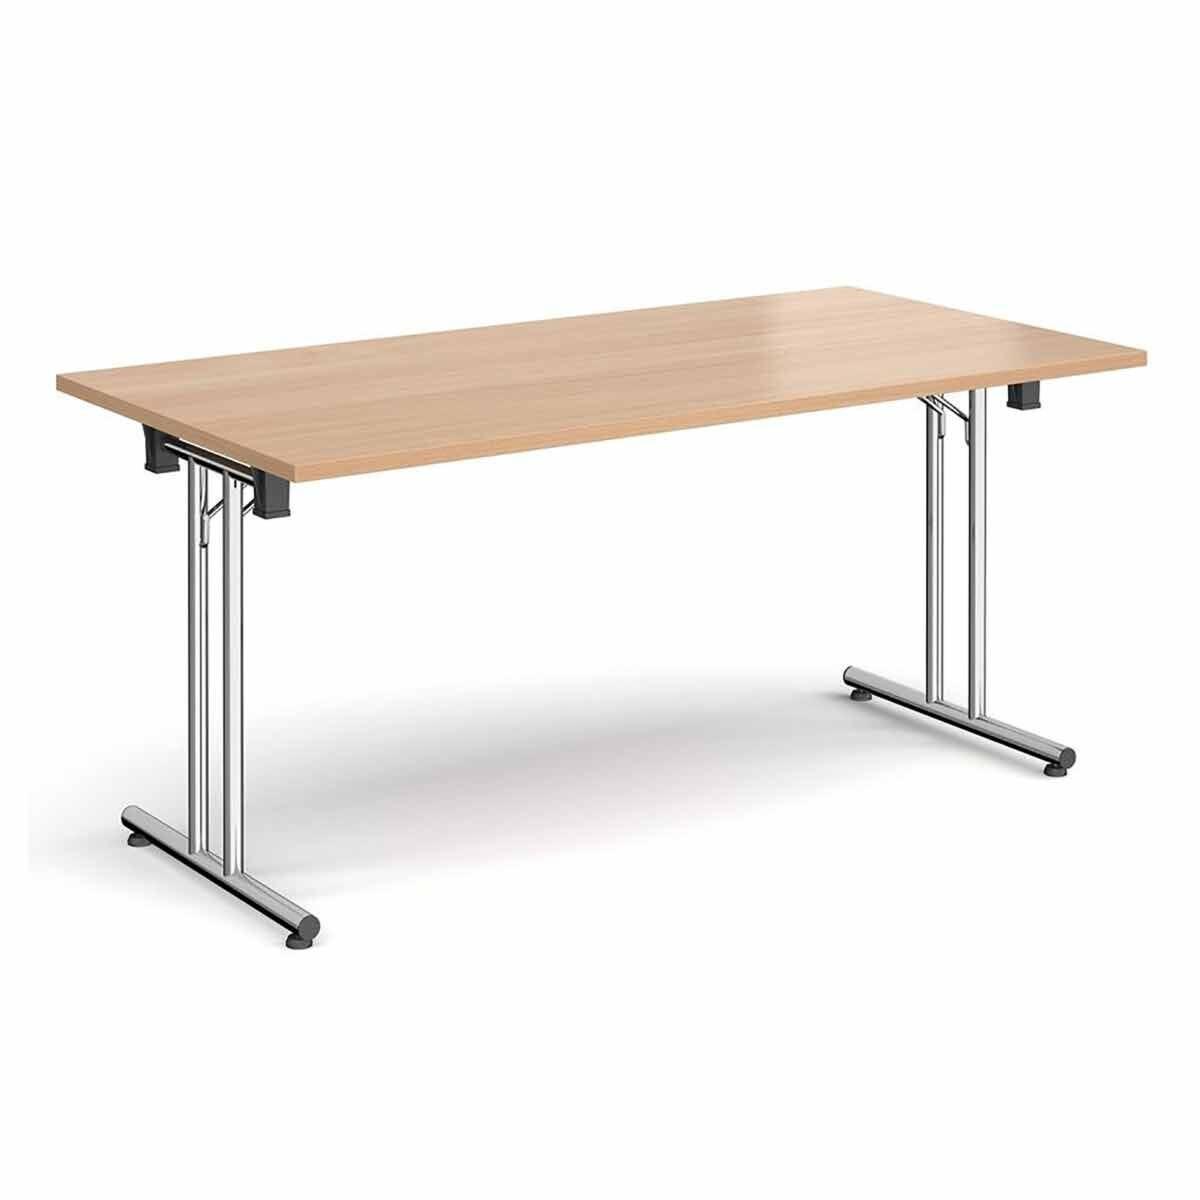 Tabilo Folding Table with Straight Chrome Frame 1200 x 800mm